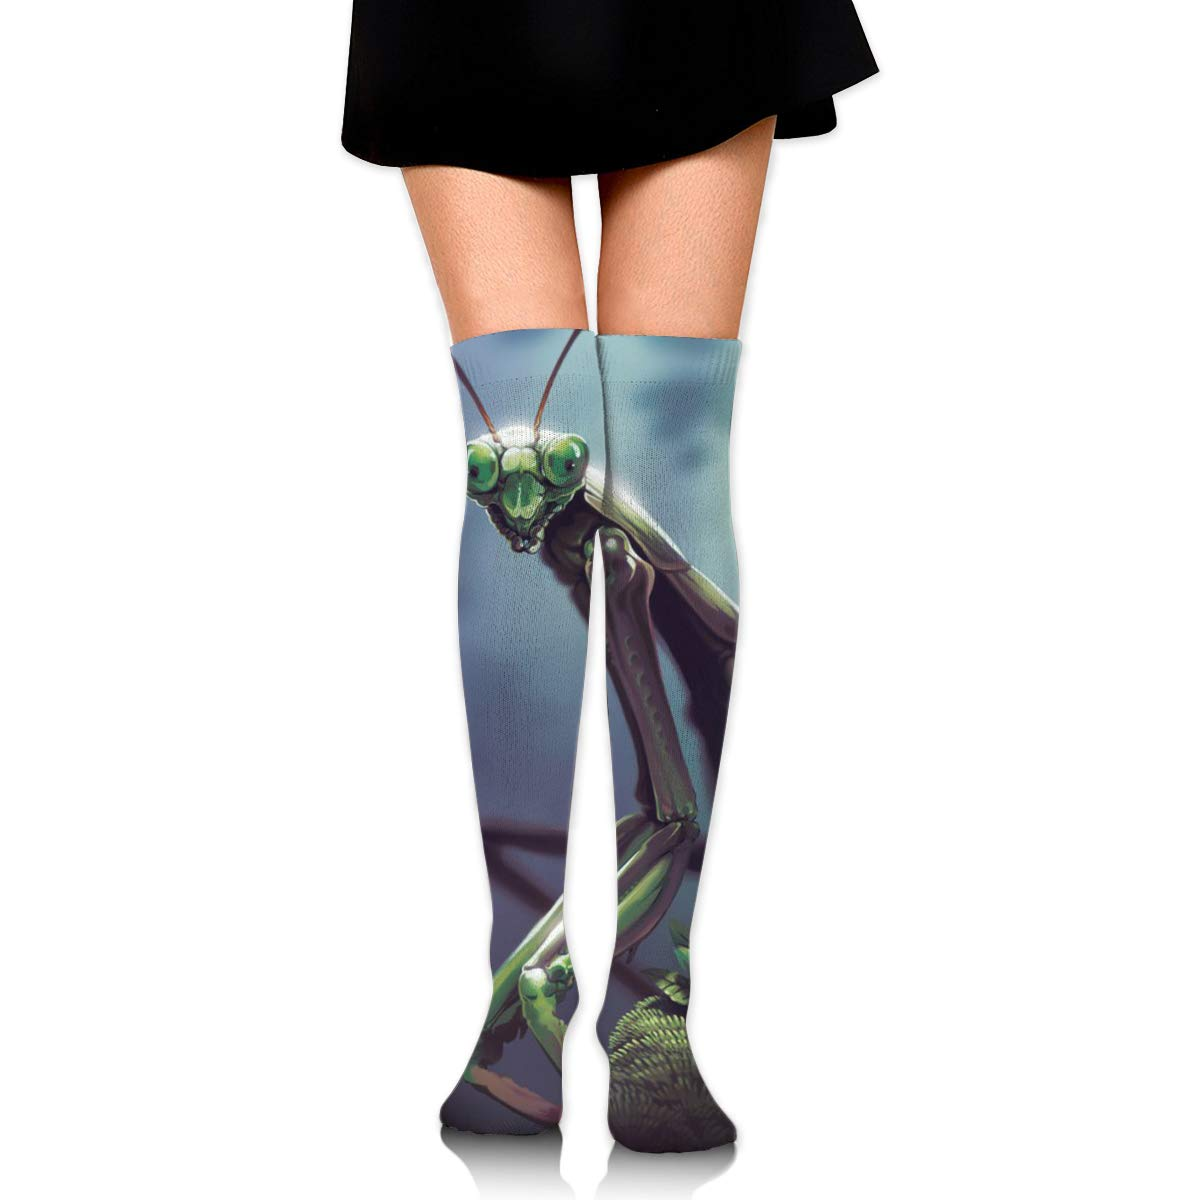 High Elasticity Girl Cotton Knee High Socks Uniform Praying Mantis Women Tube Socks